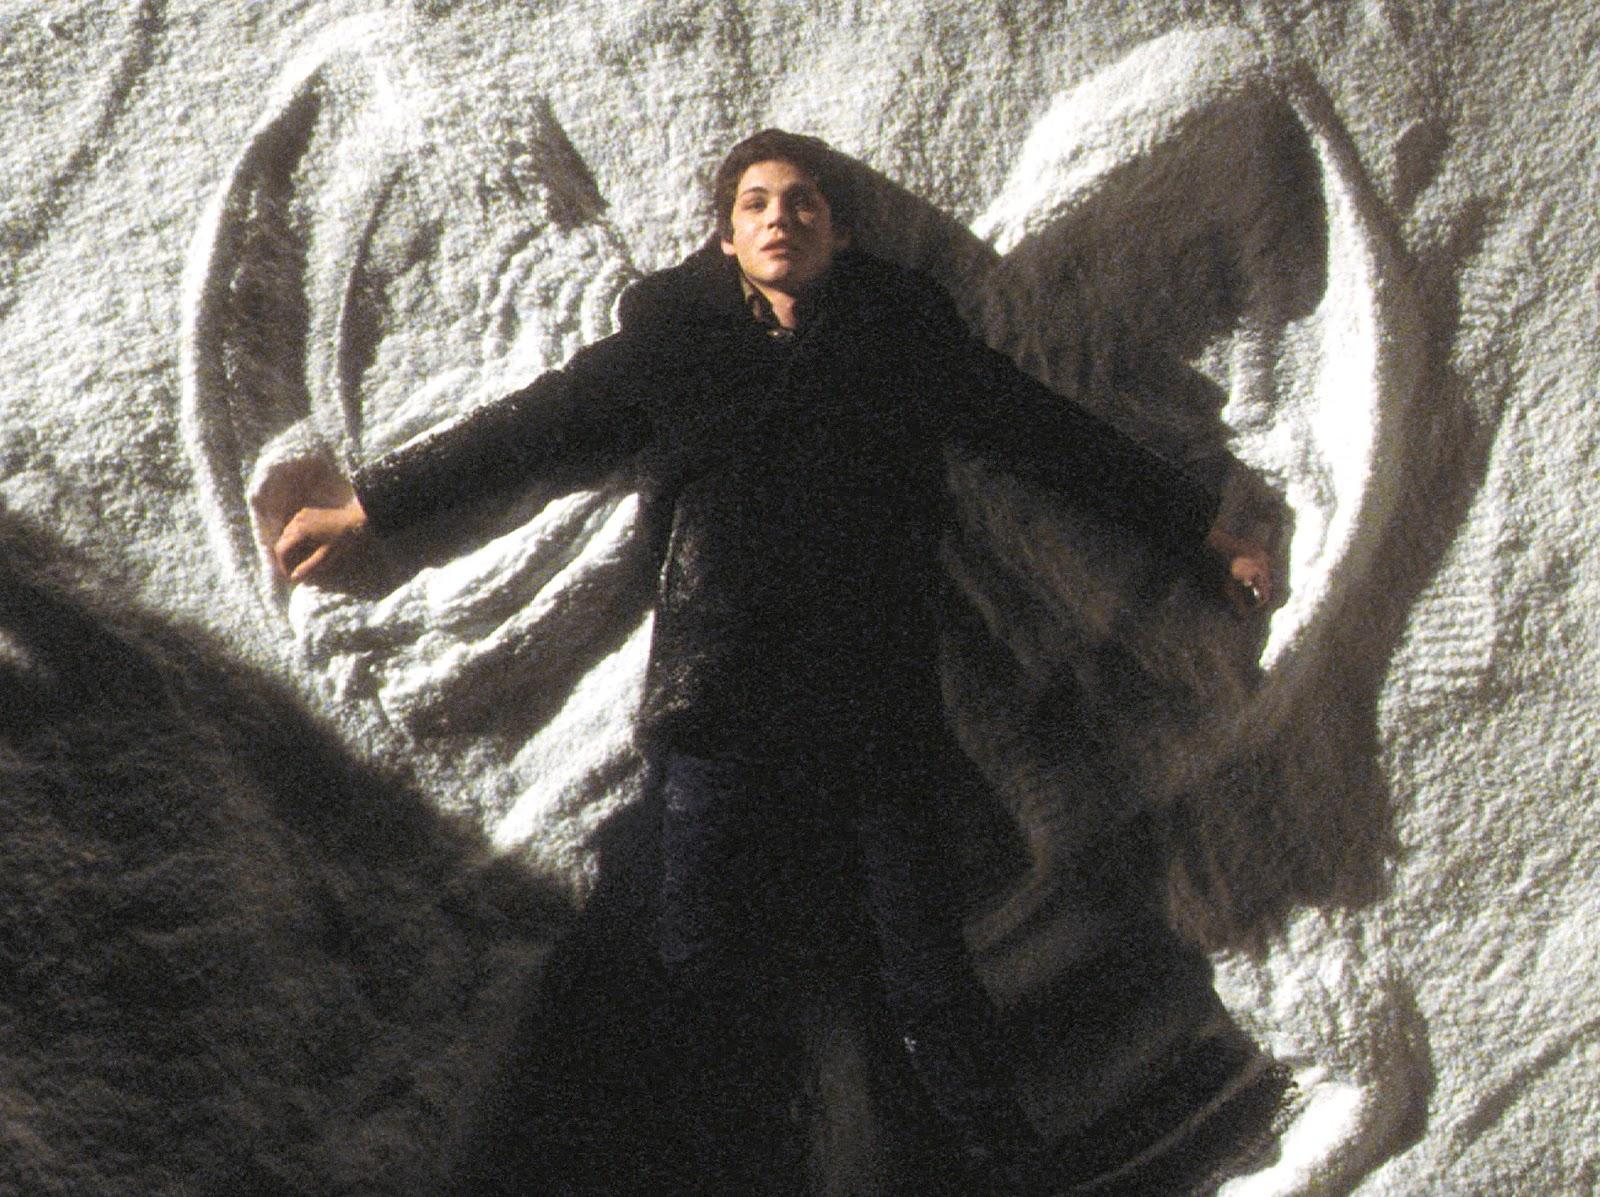 Logan Lerman Perks Of Being A Wallflower